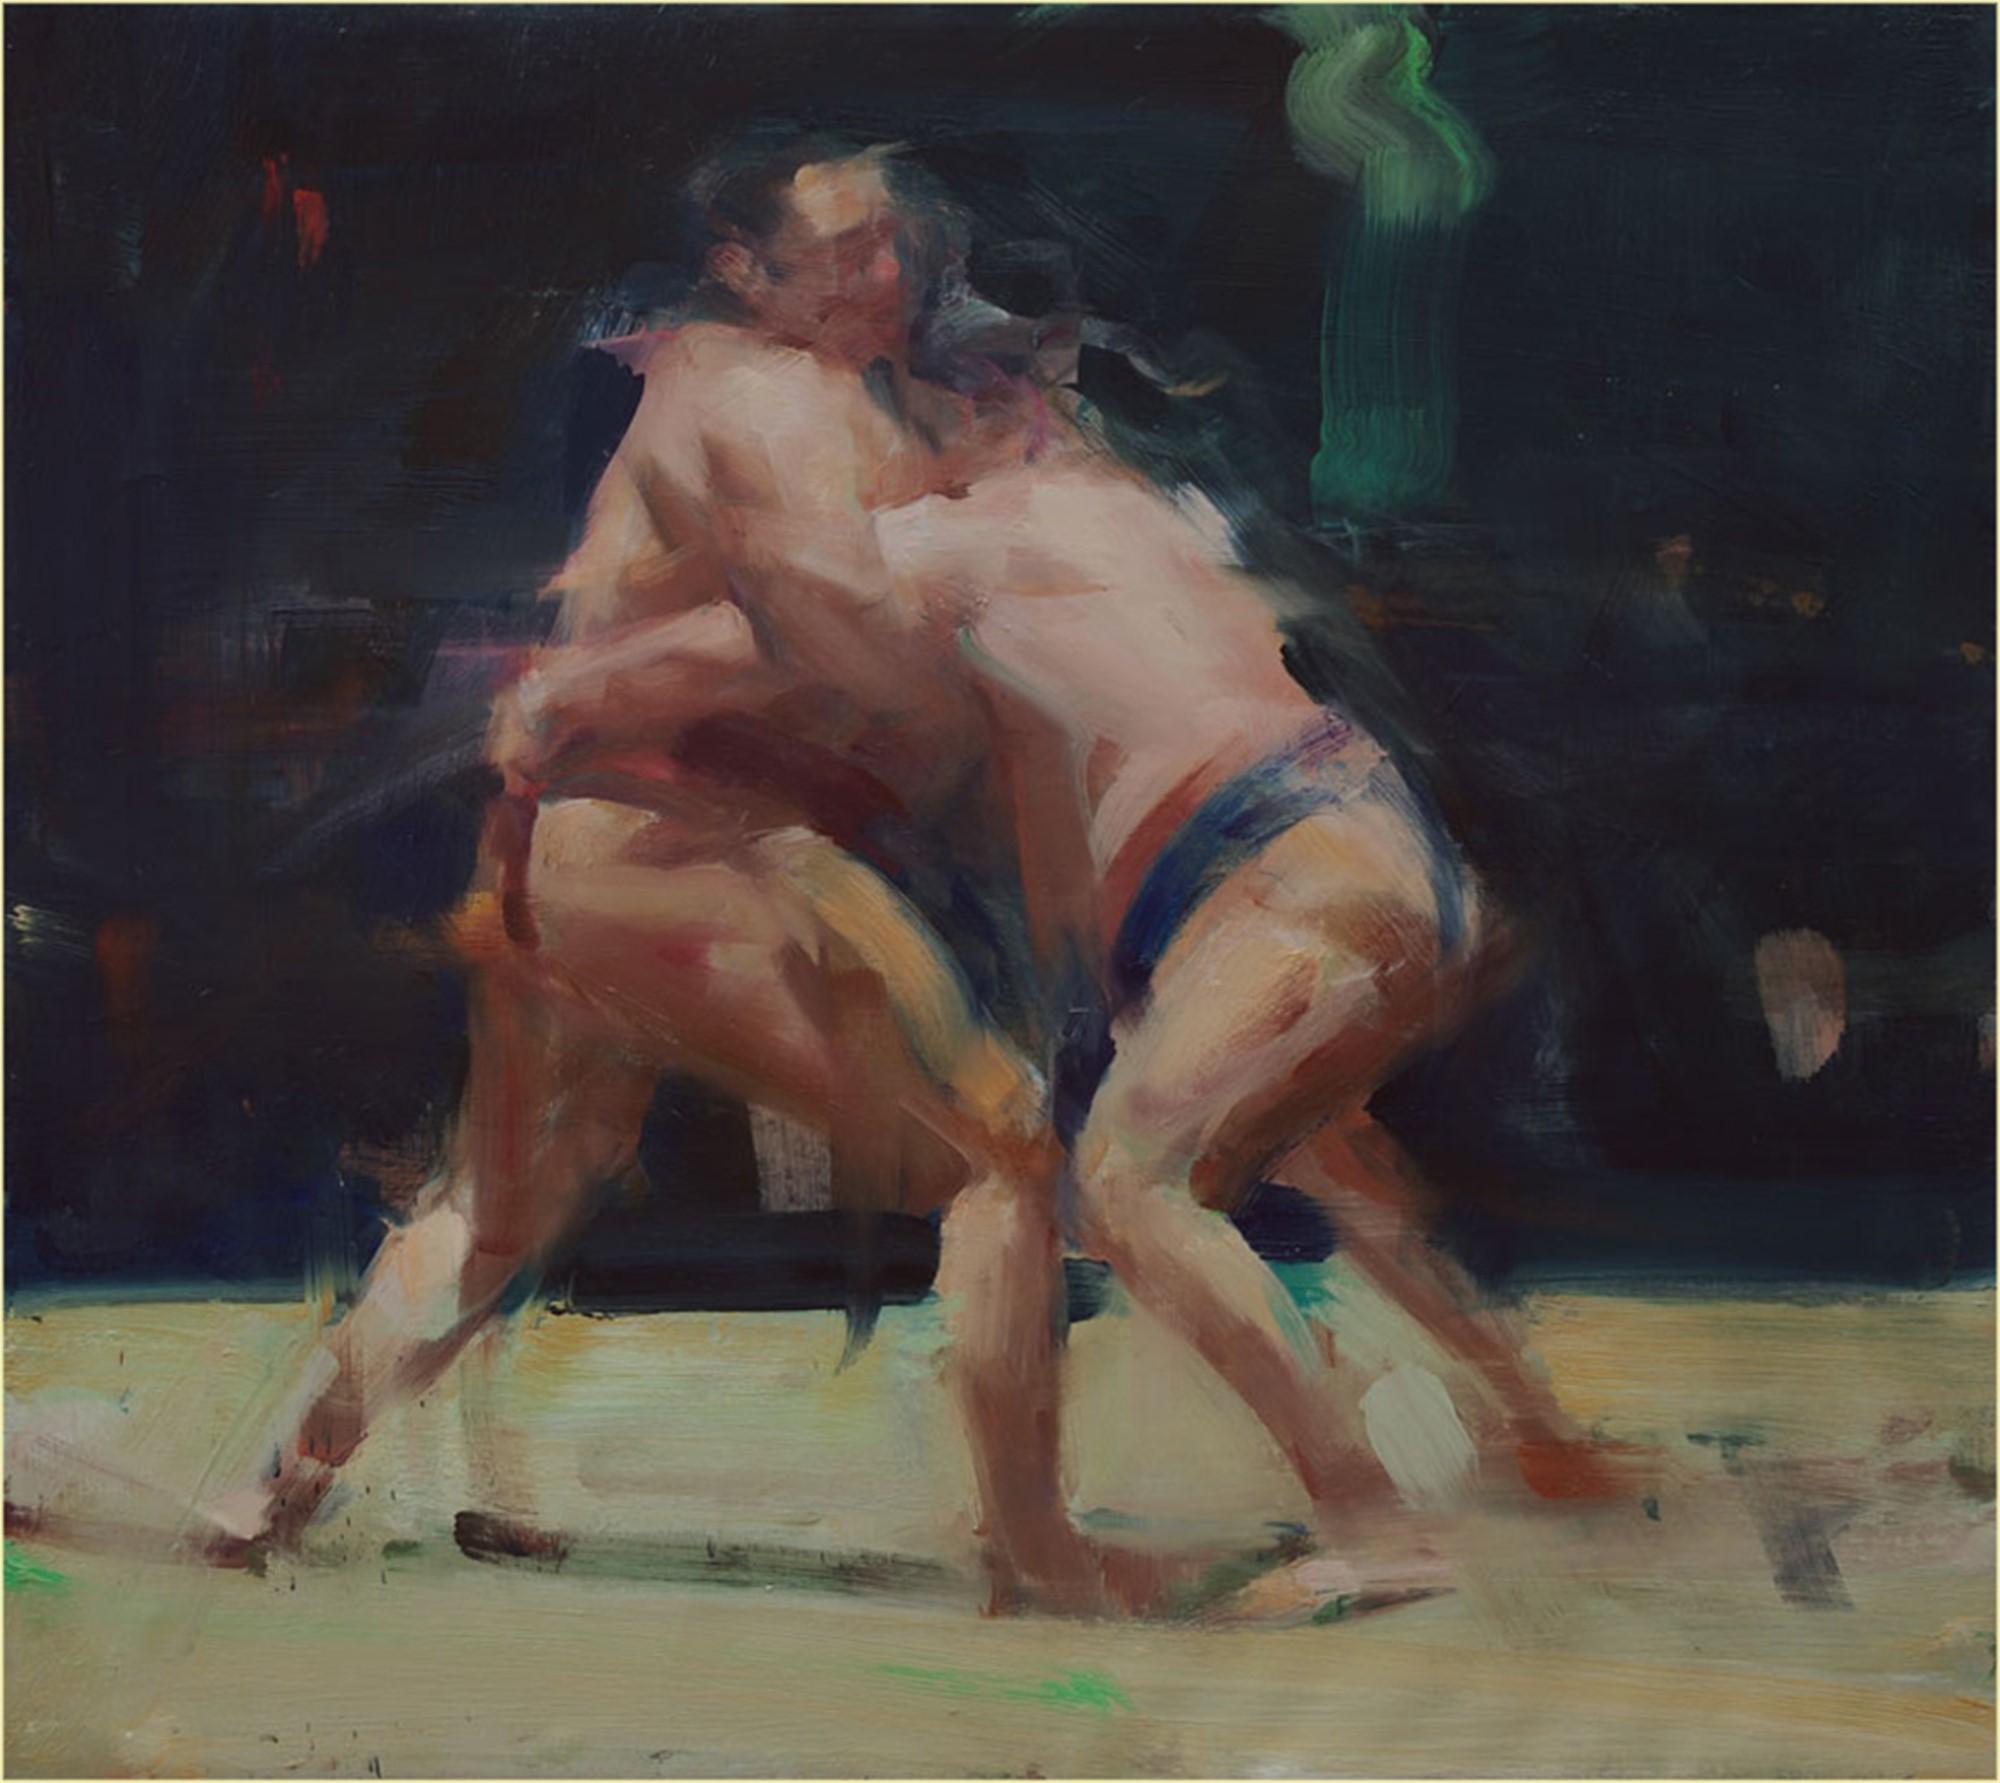 Two Wrestlers by David Shevlino